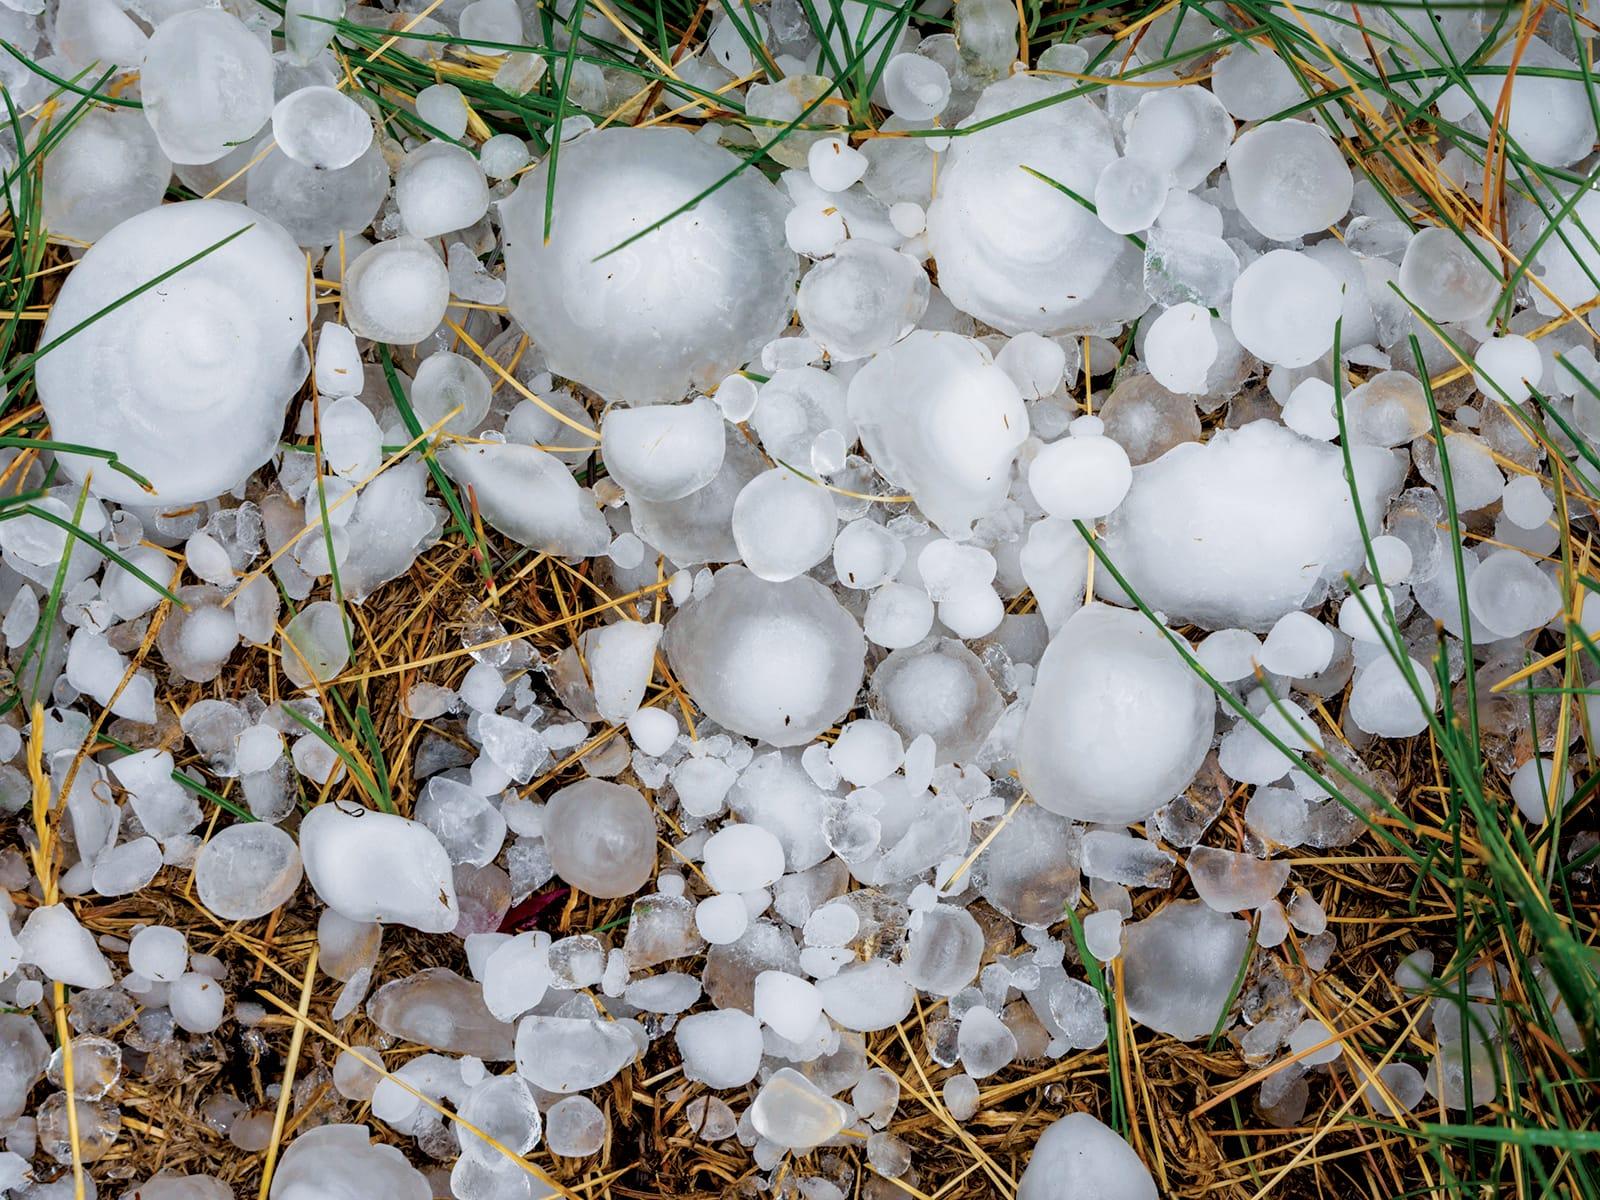 Hailstones_Jeff-March_Alamy-Stock-Photo